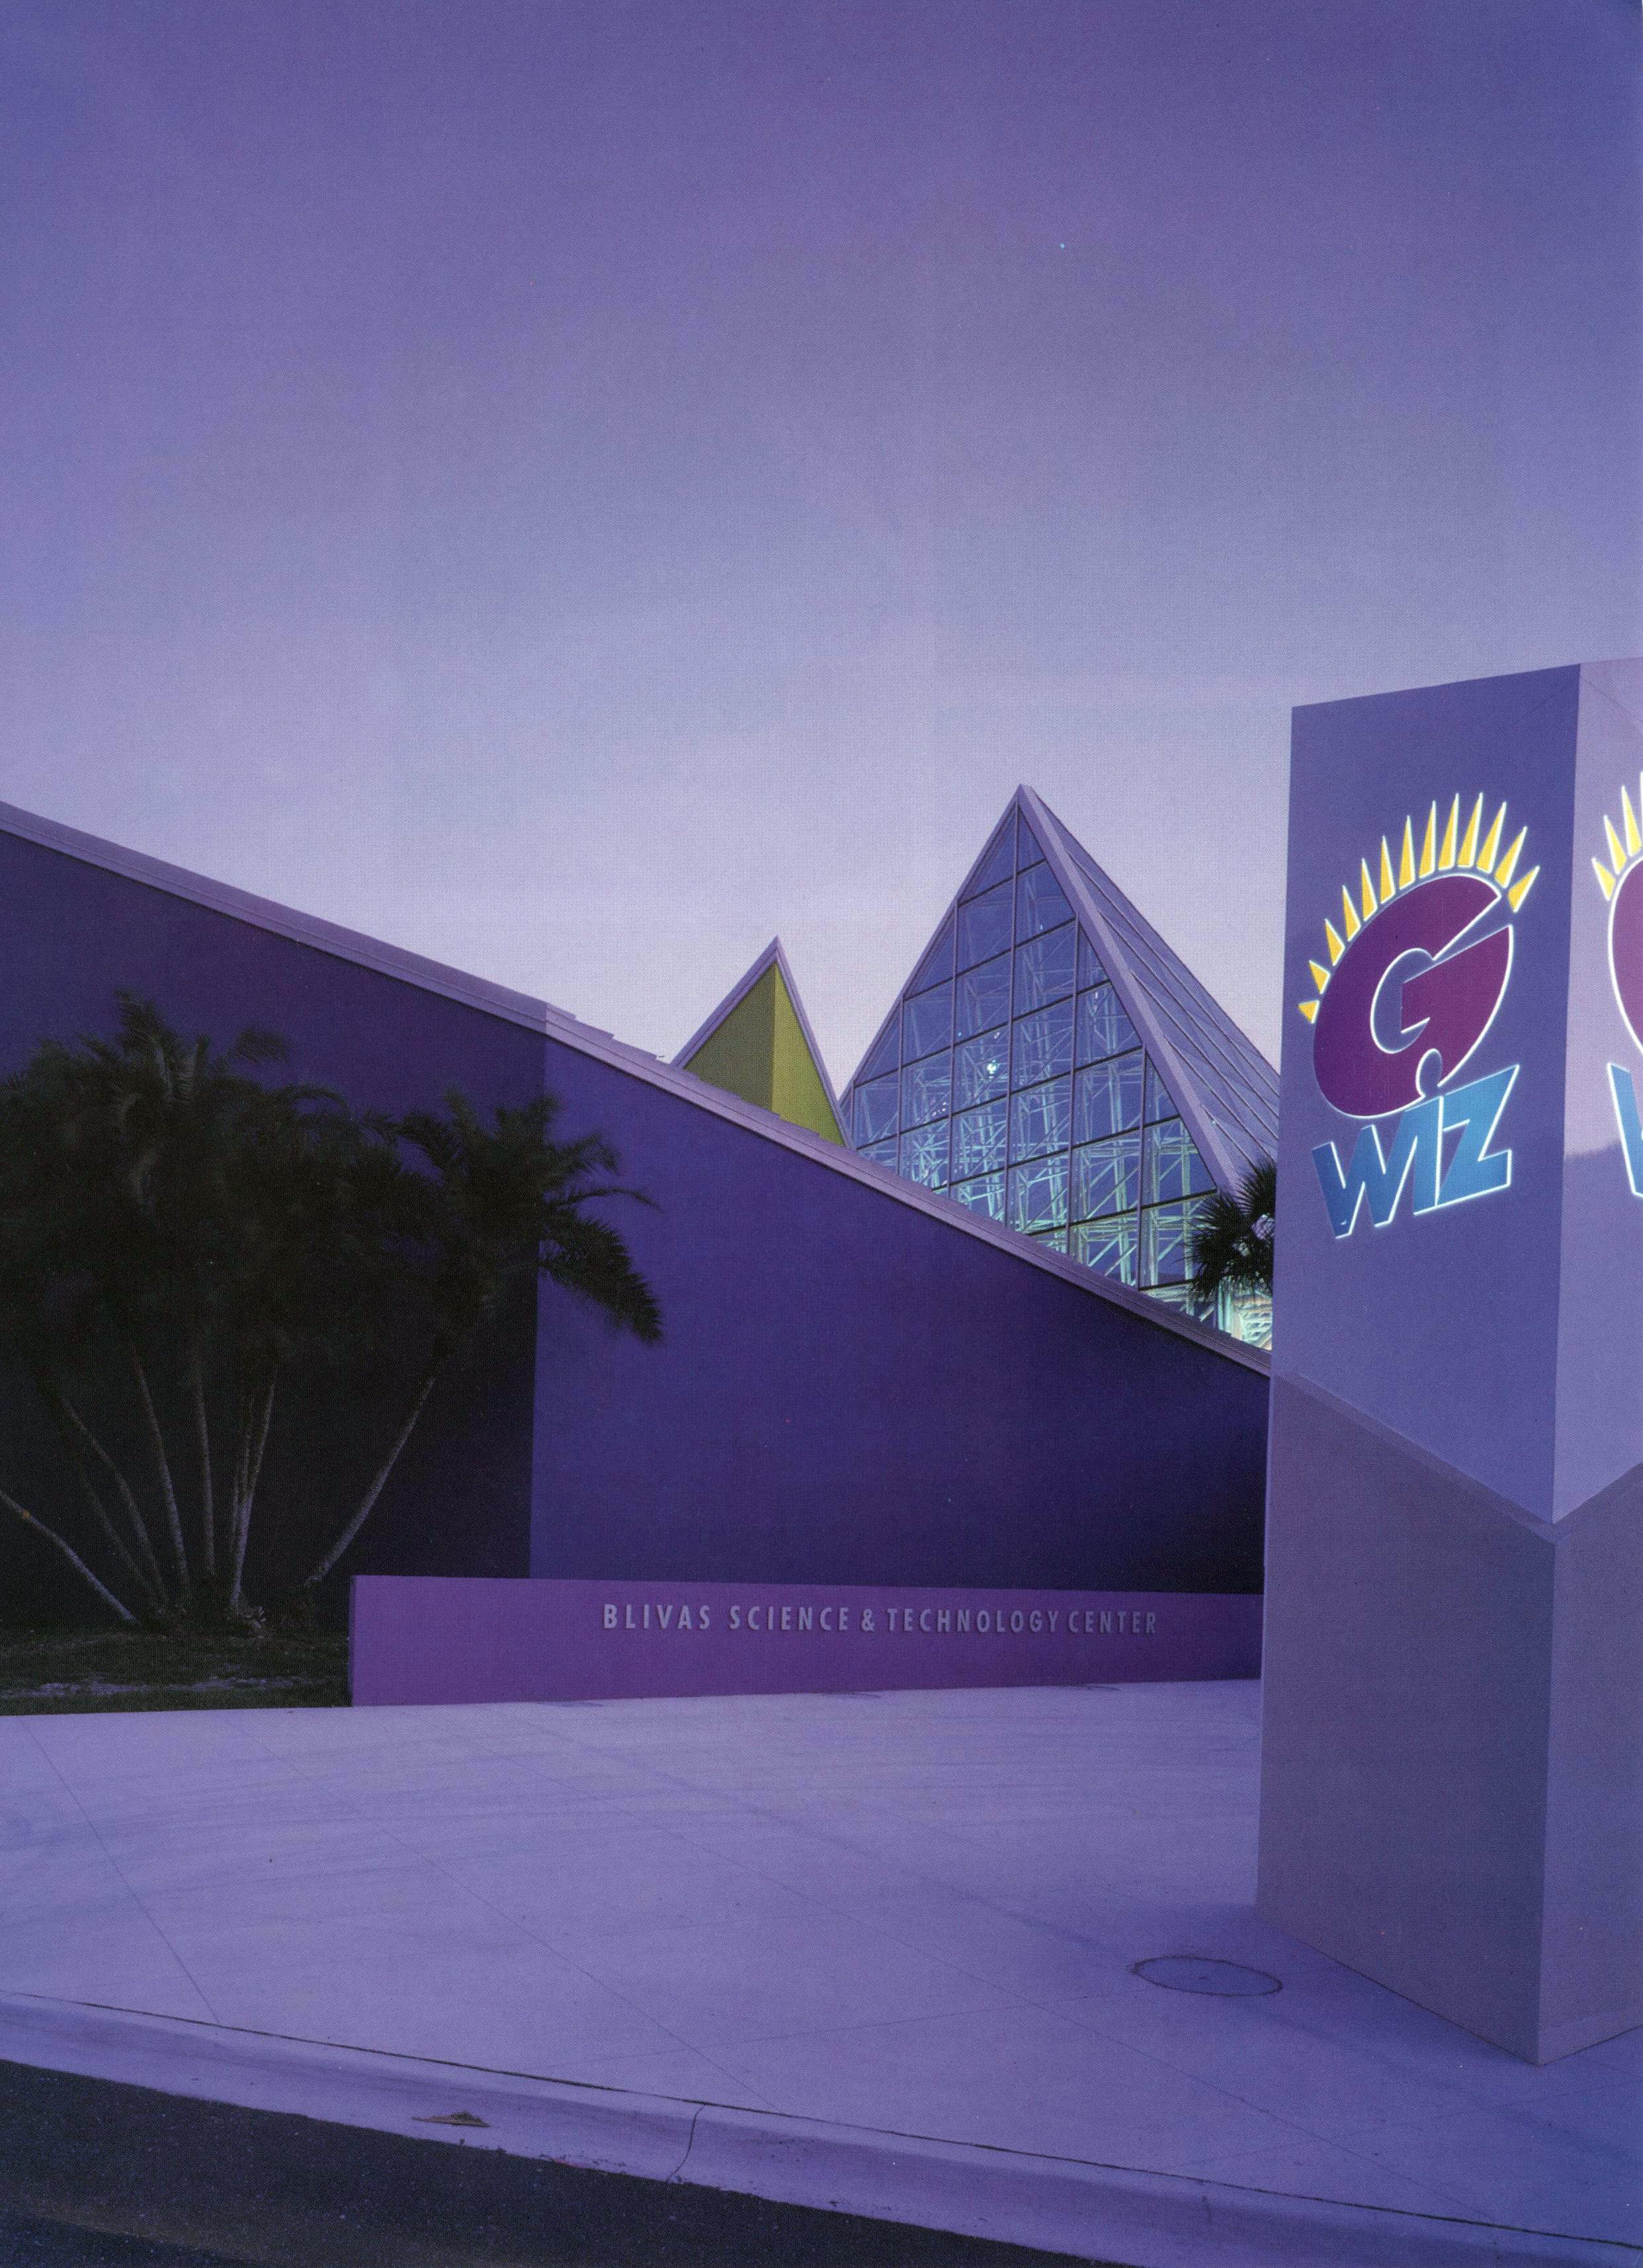 Florida Architect 2001 (Publications) 002 SC-11.jpg